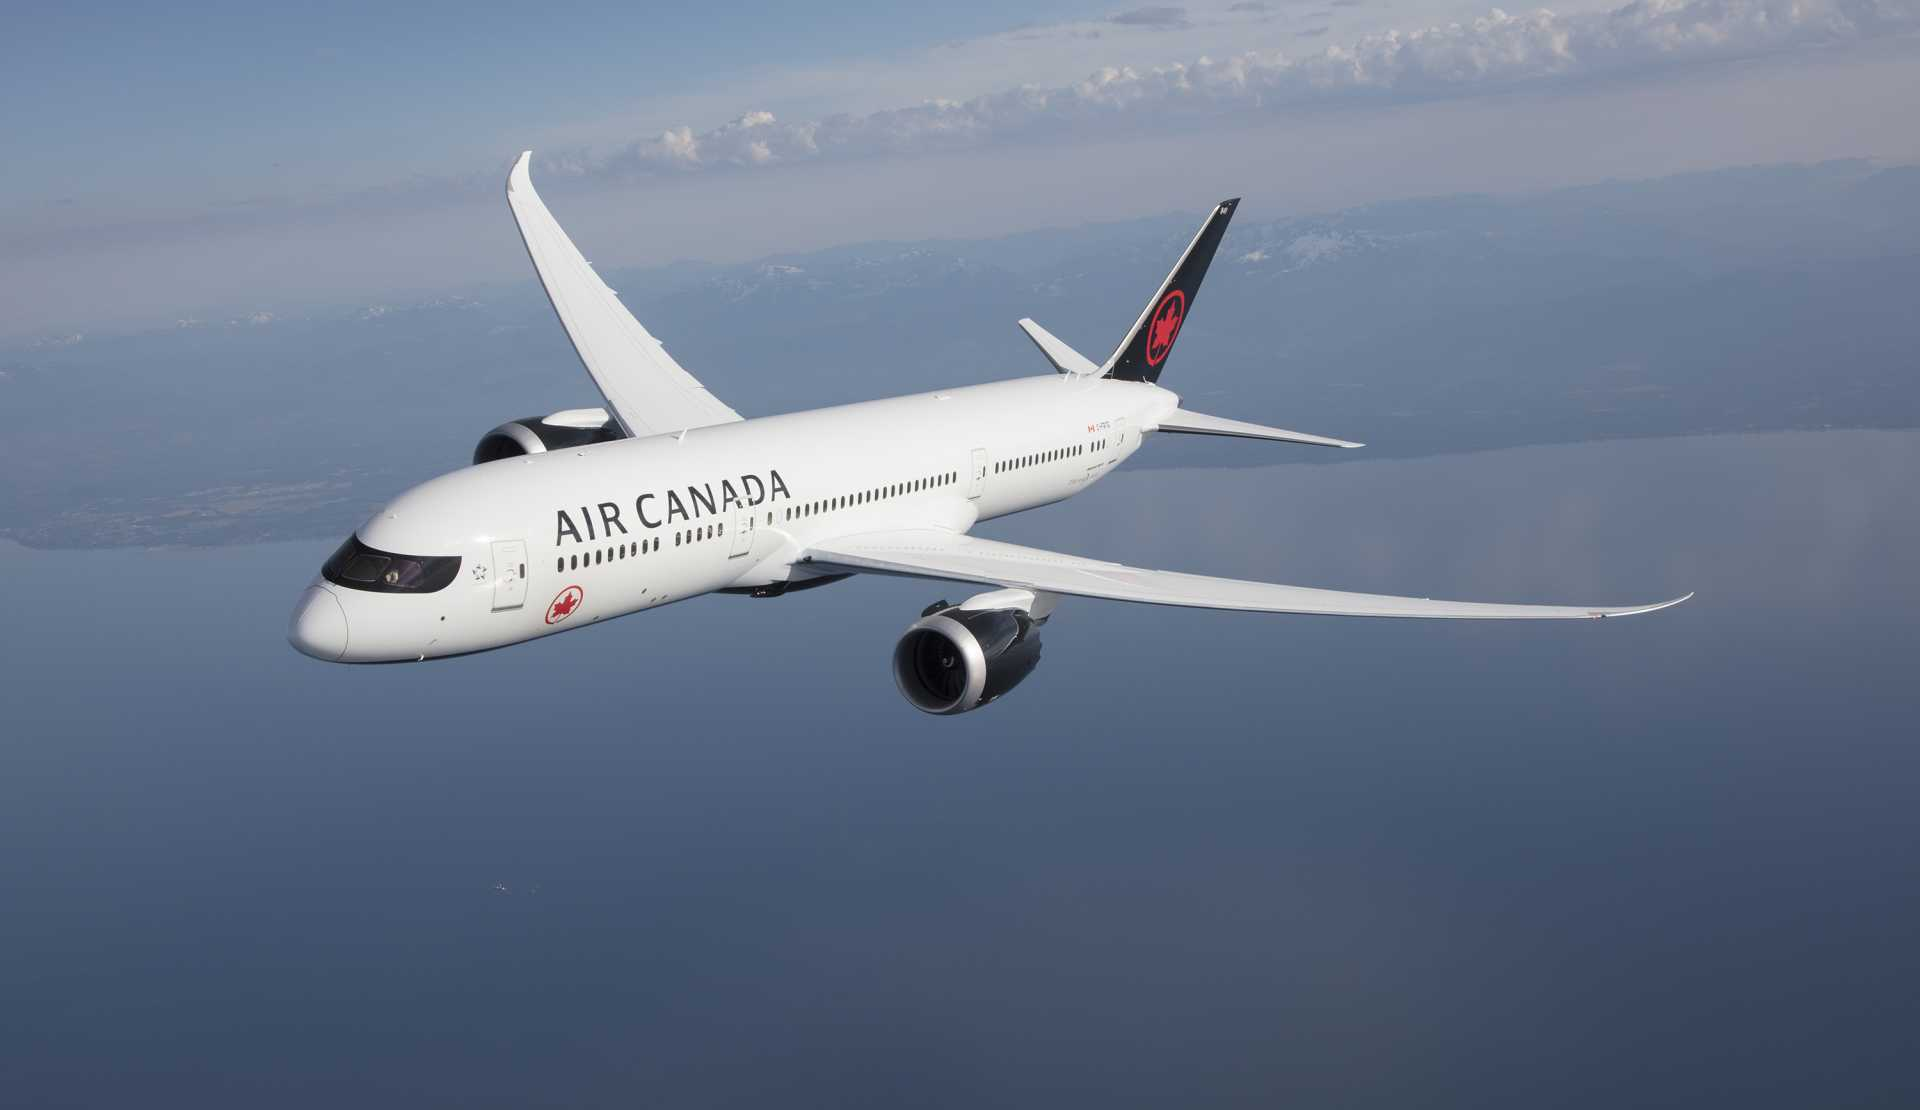 Air Canada: New Livery (September 2017)